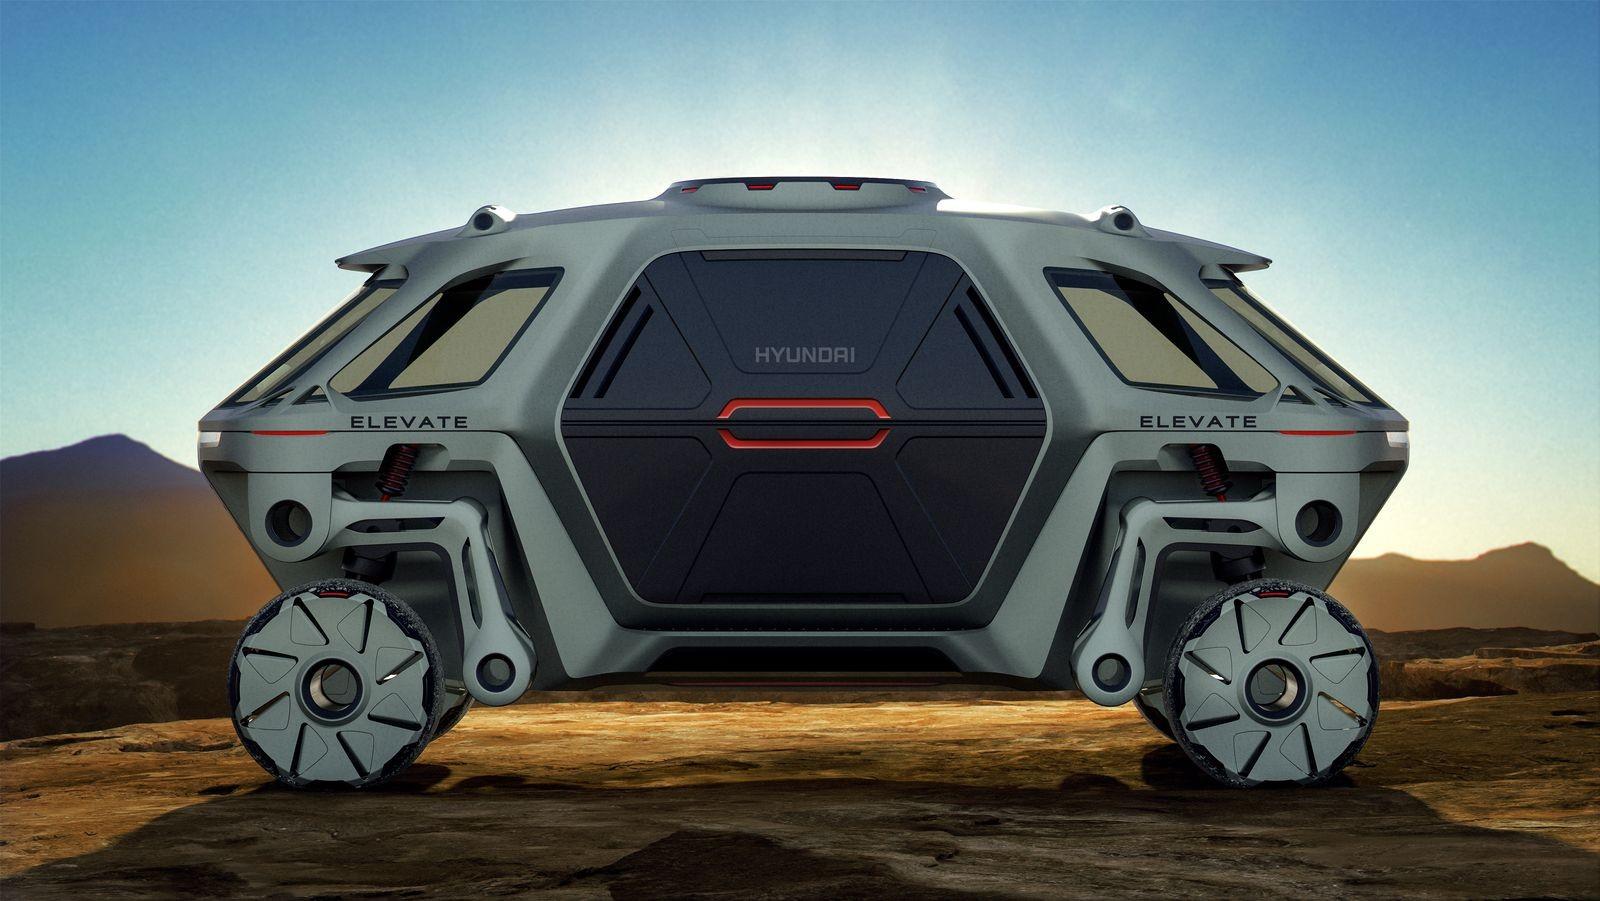 hyundai-elevate-walking-car-concept-1